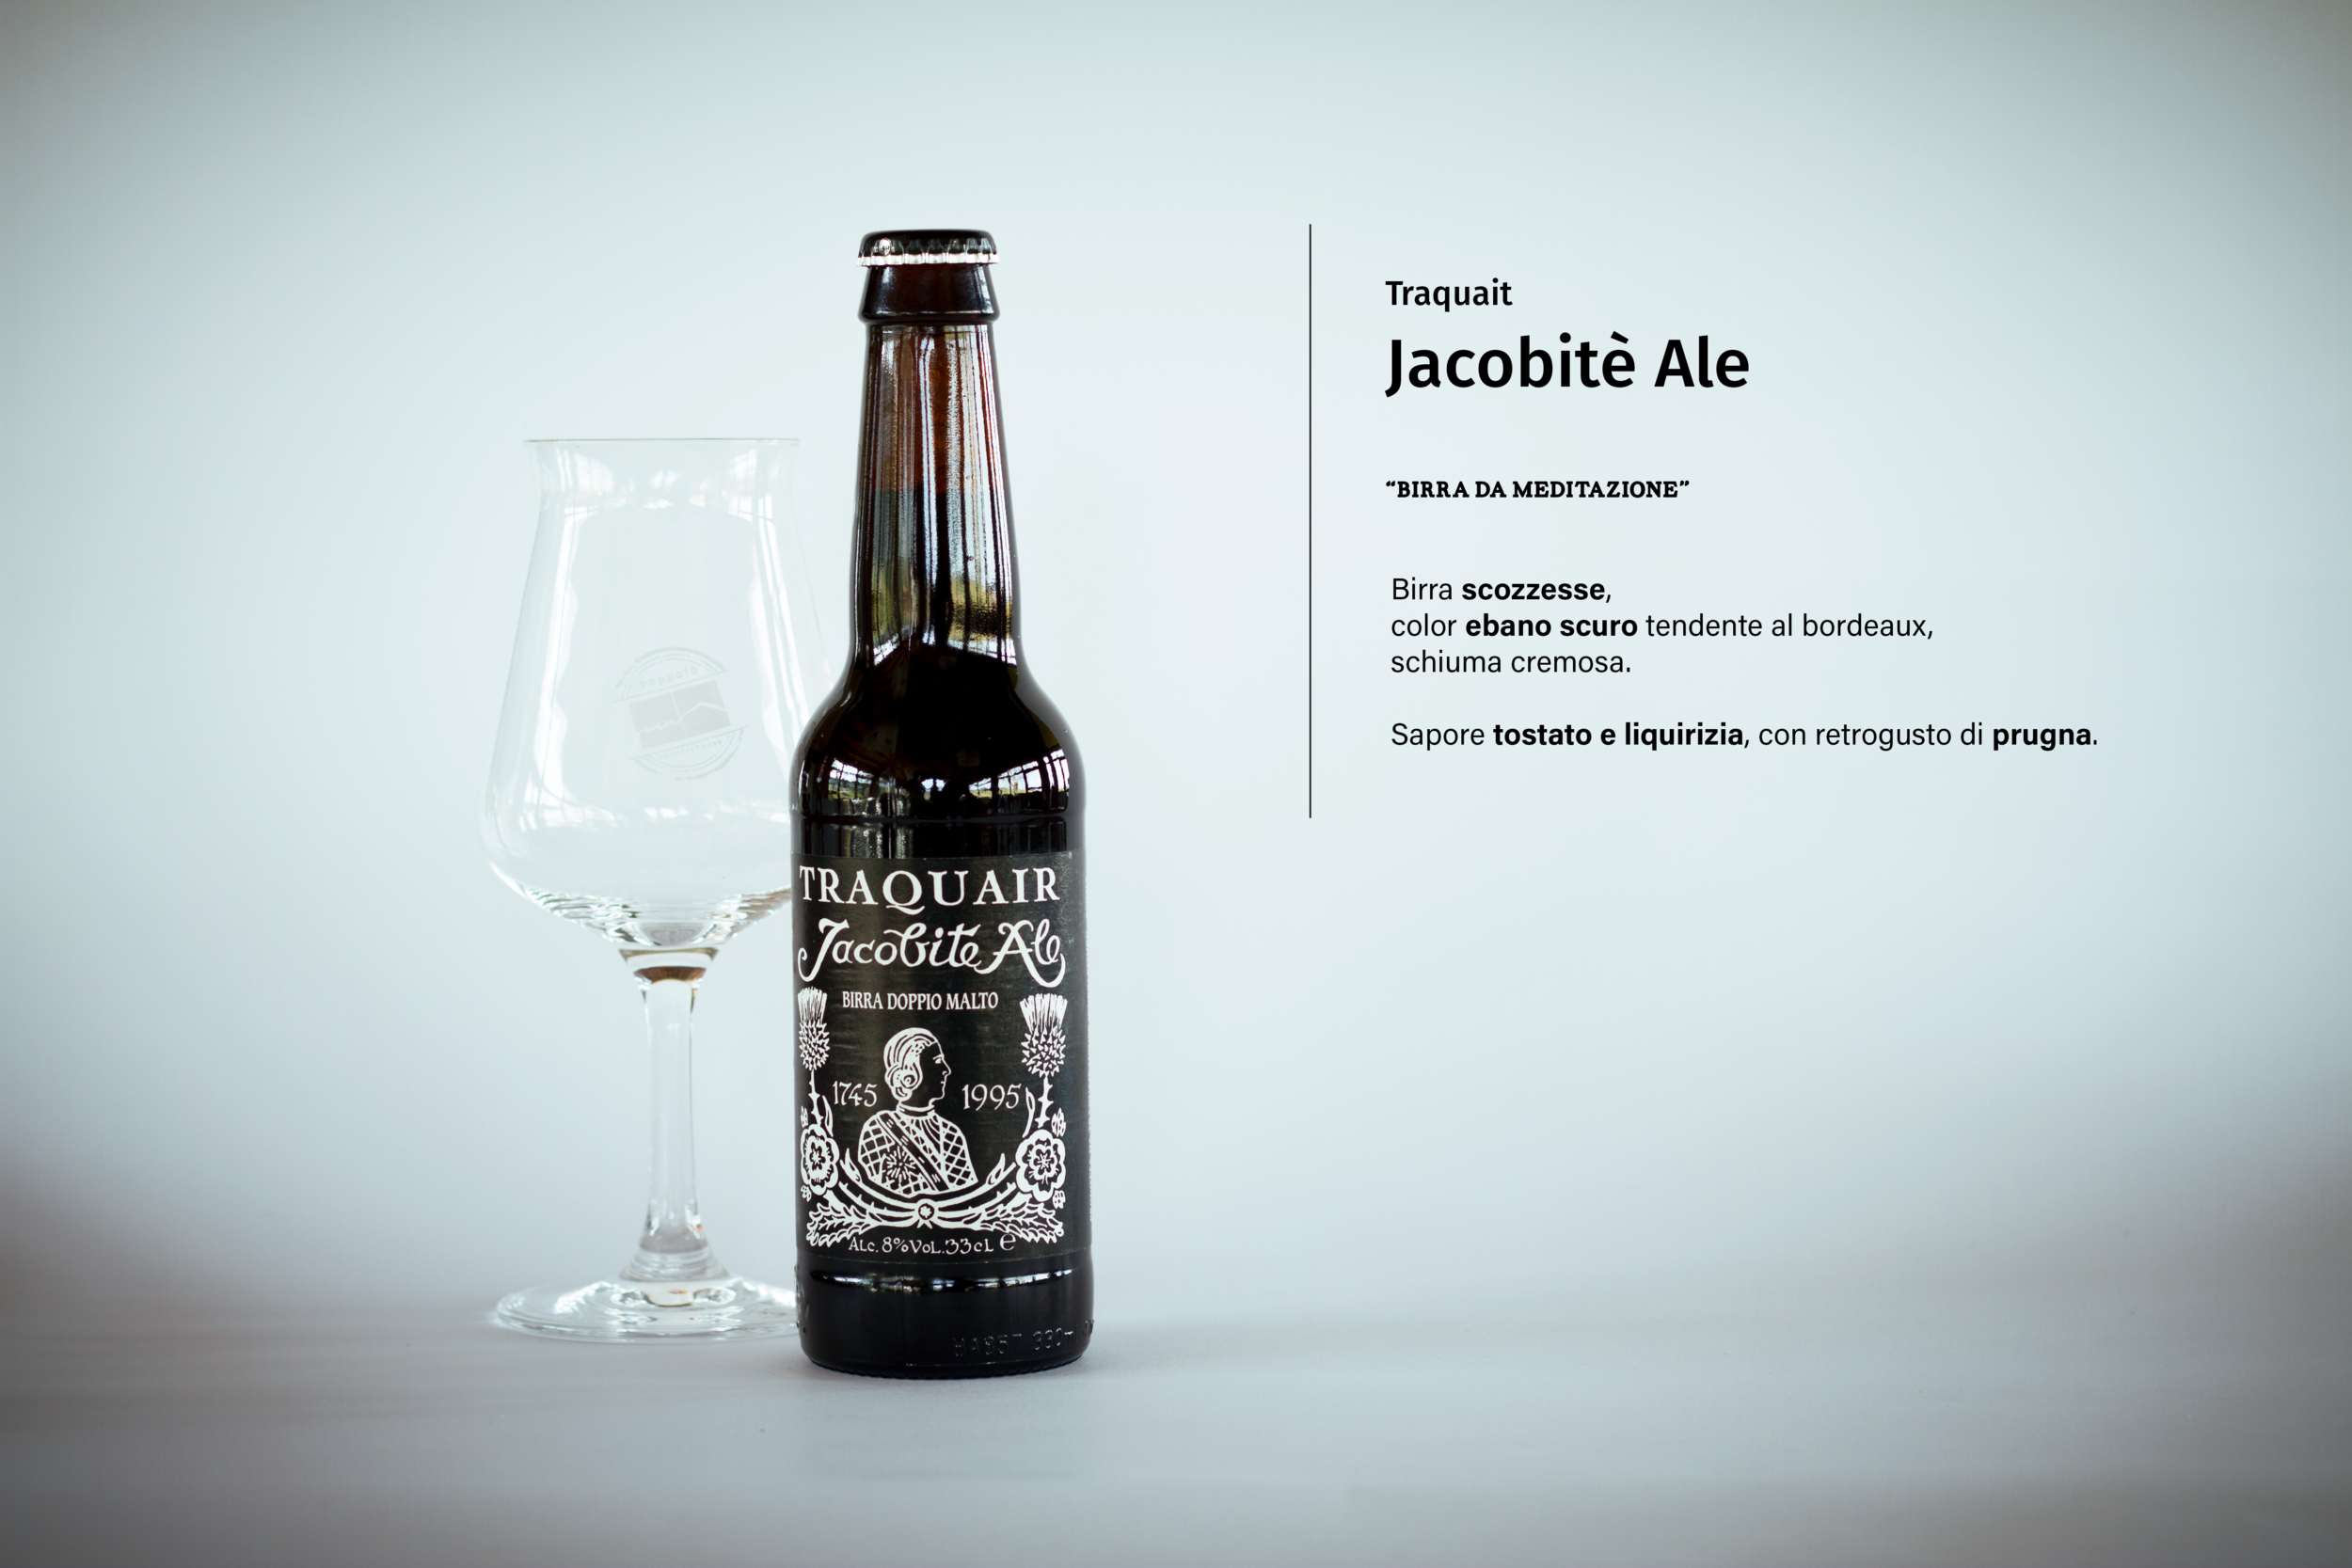 Traquair Jacobite Ale.png